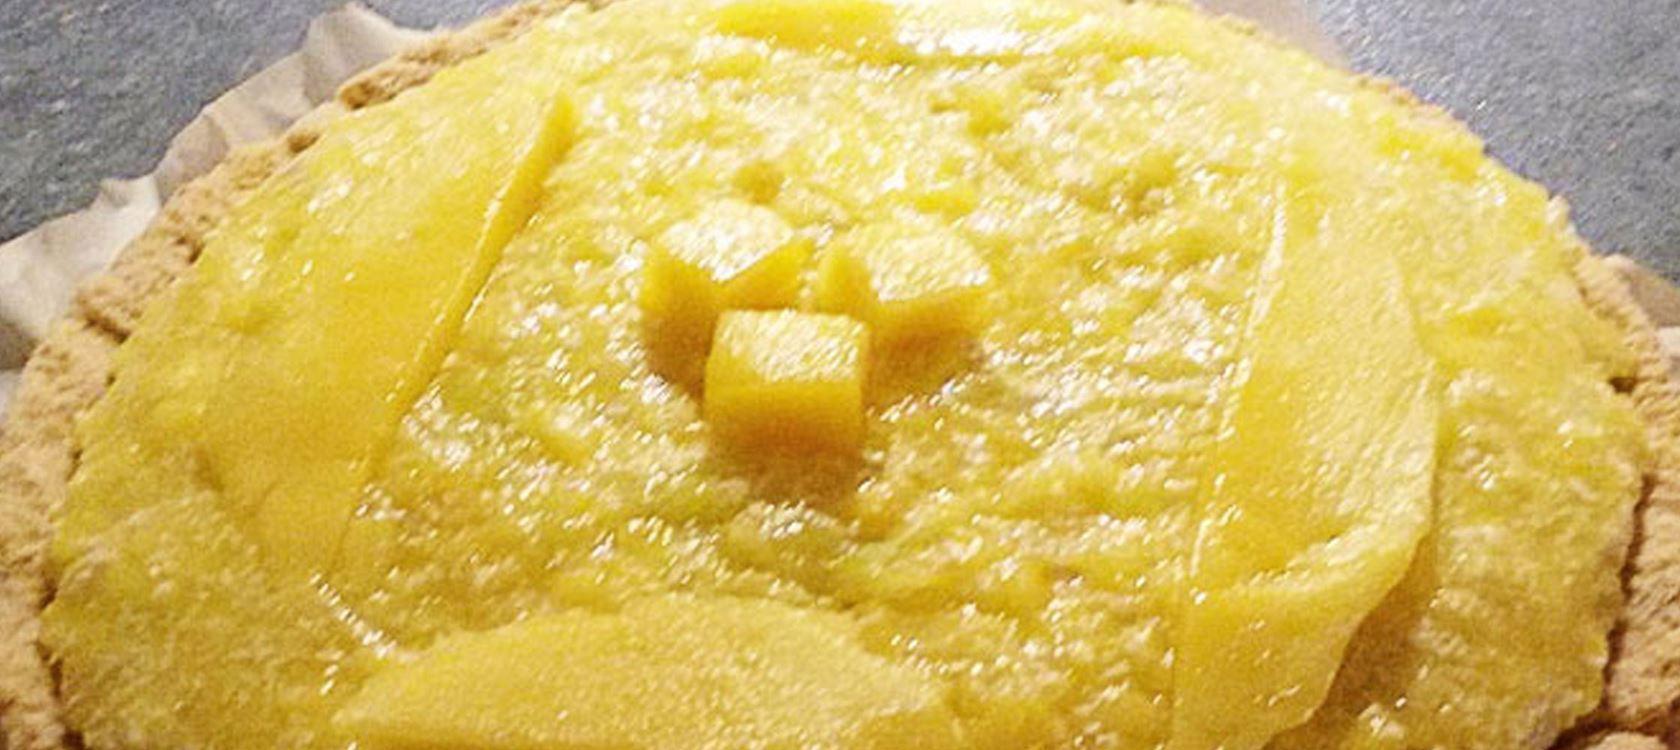 Lactosevrije mangocheesecake